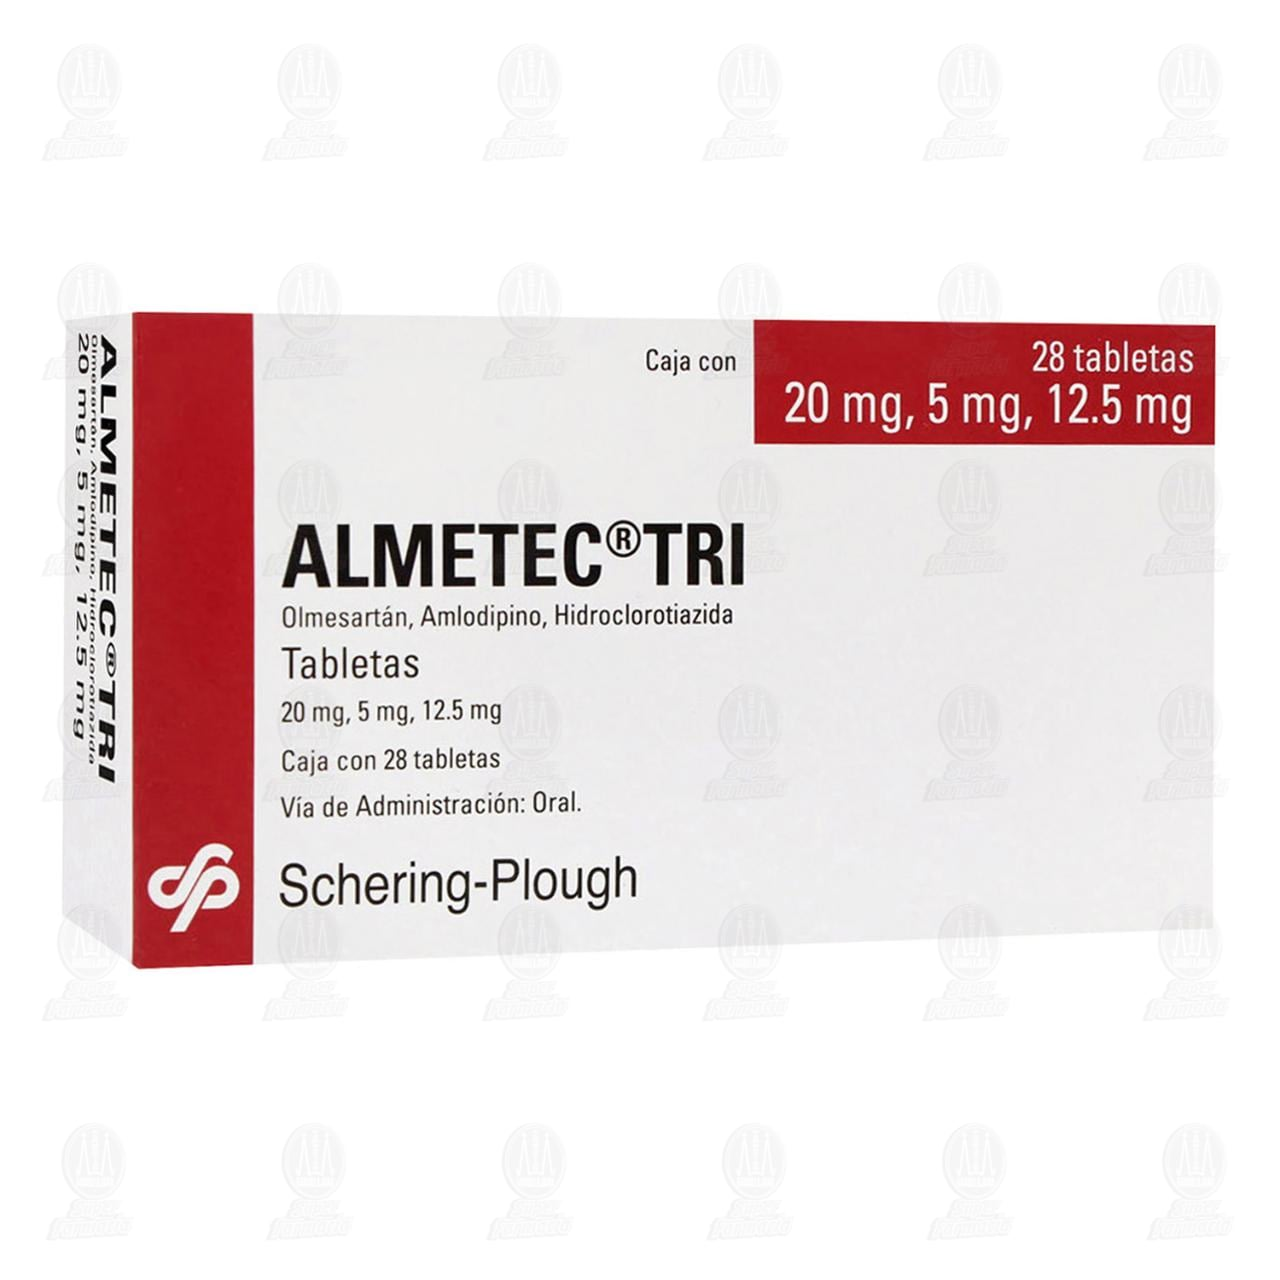 Comprar Almetec Tri 20mg/5mg/12.5mg 28 Tabletas en Farmacias Guadalajara